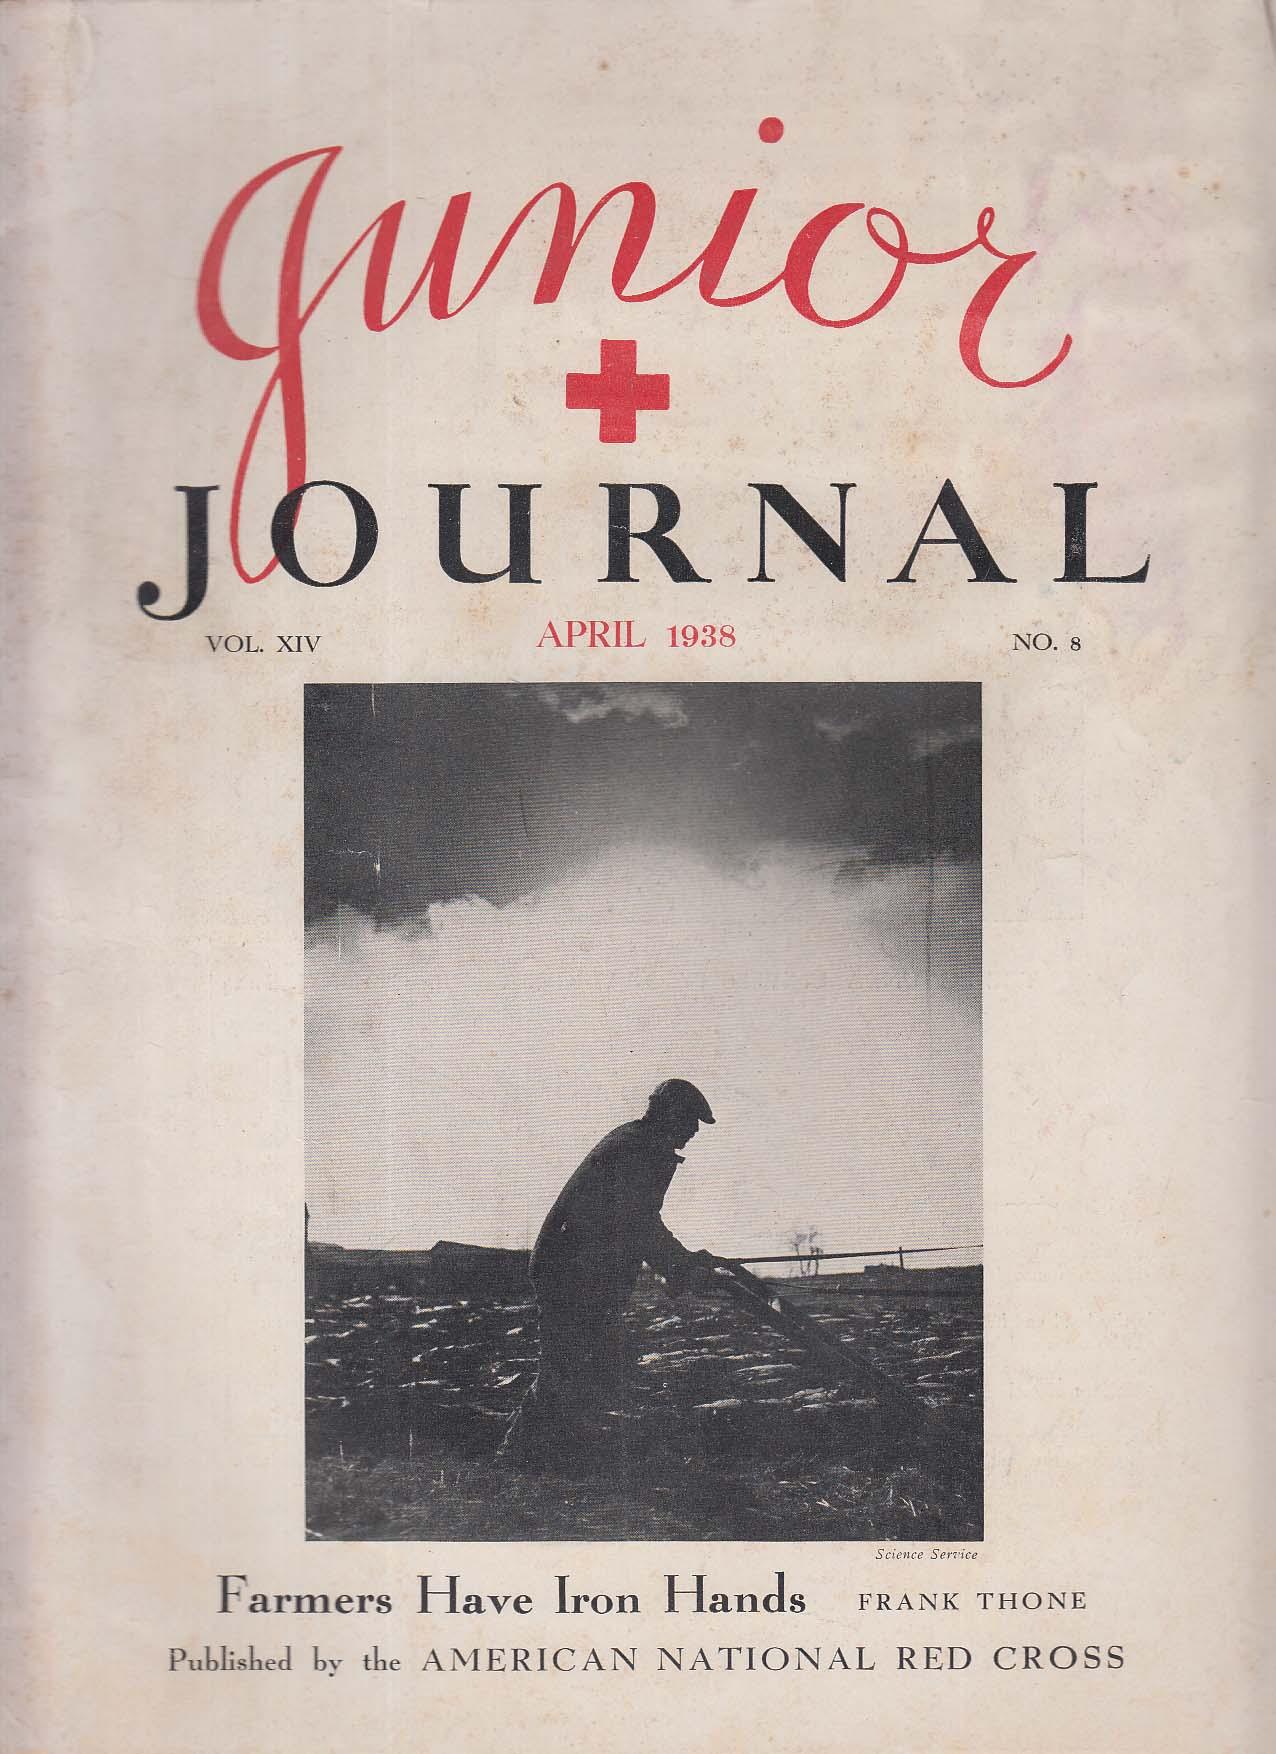 c1636de0ec2 JUNIOR JOURNAL American National Red Cross Frank Thone Karl Detzer + 4 1938